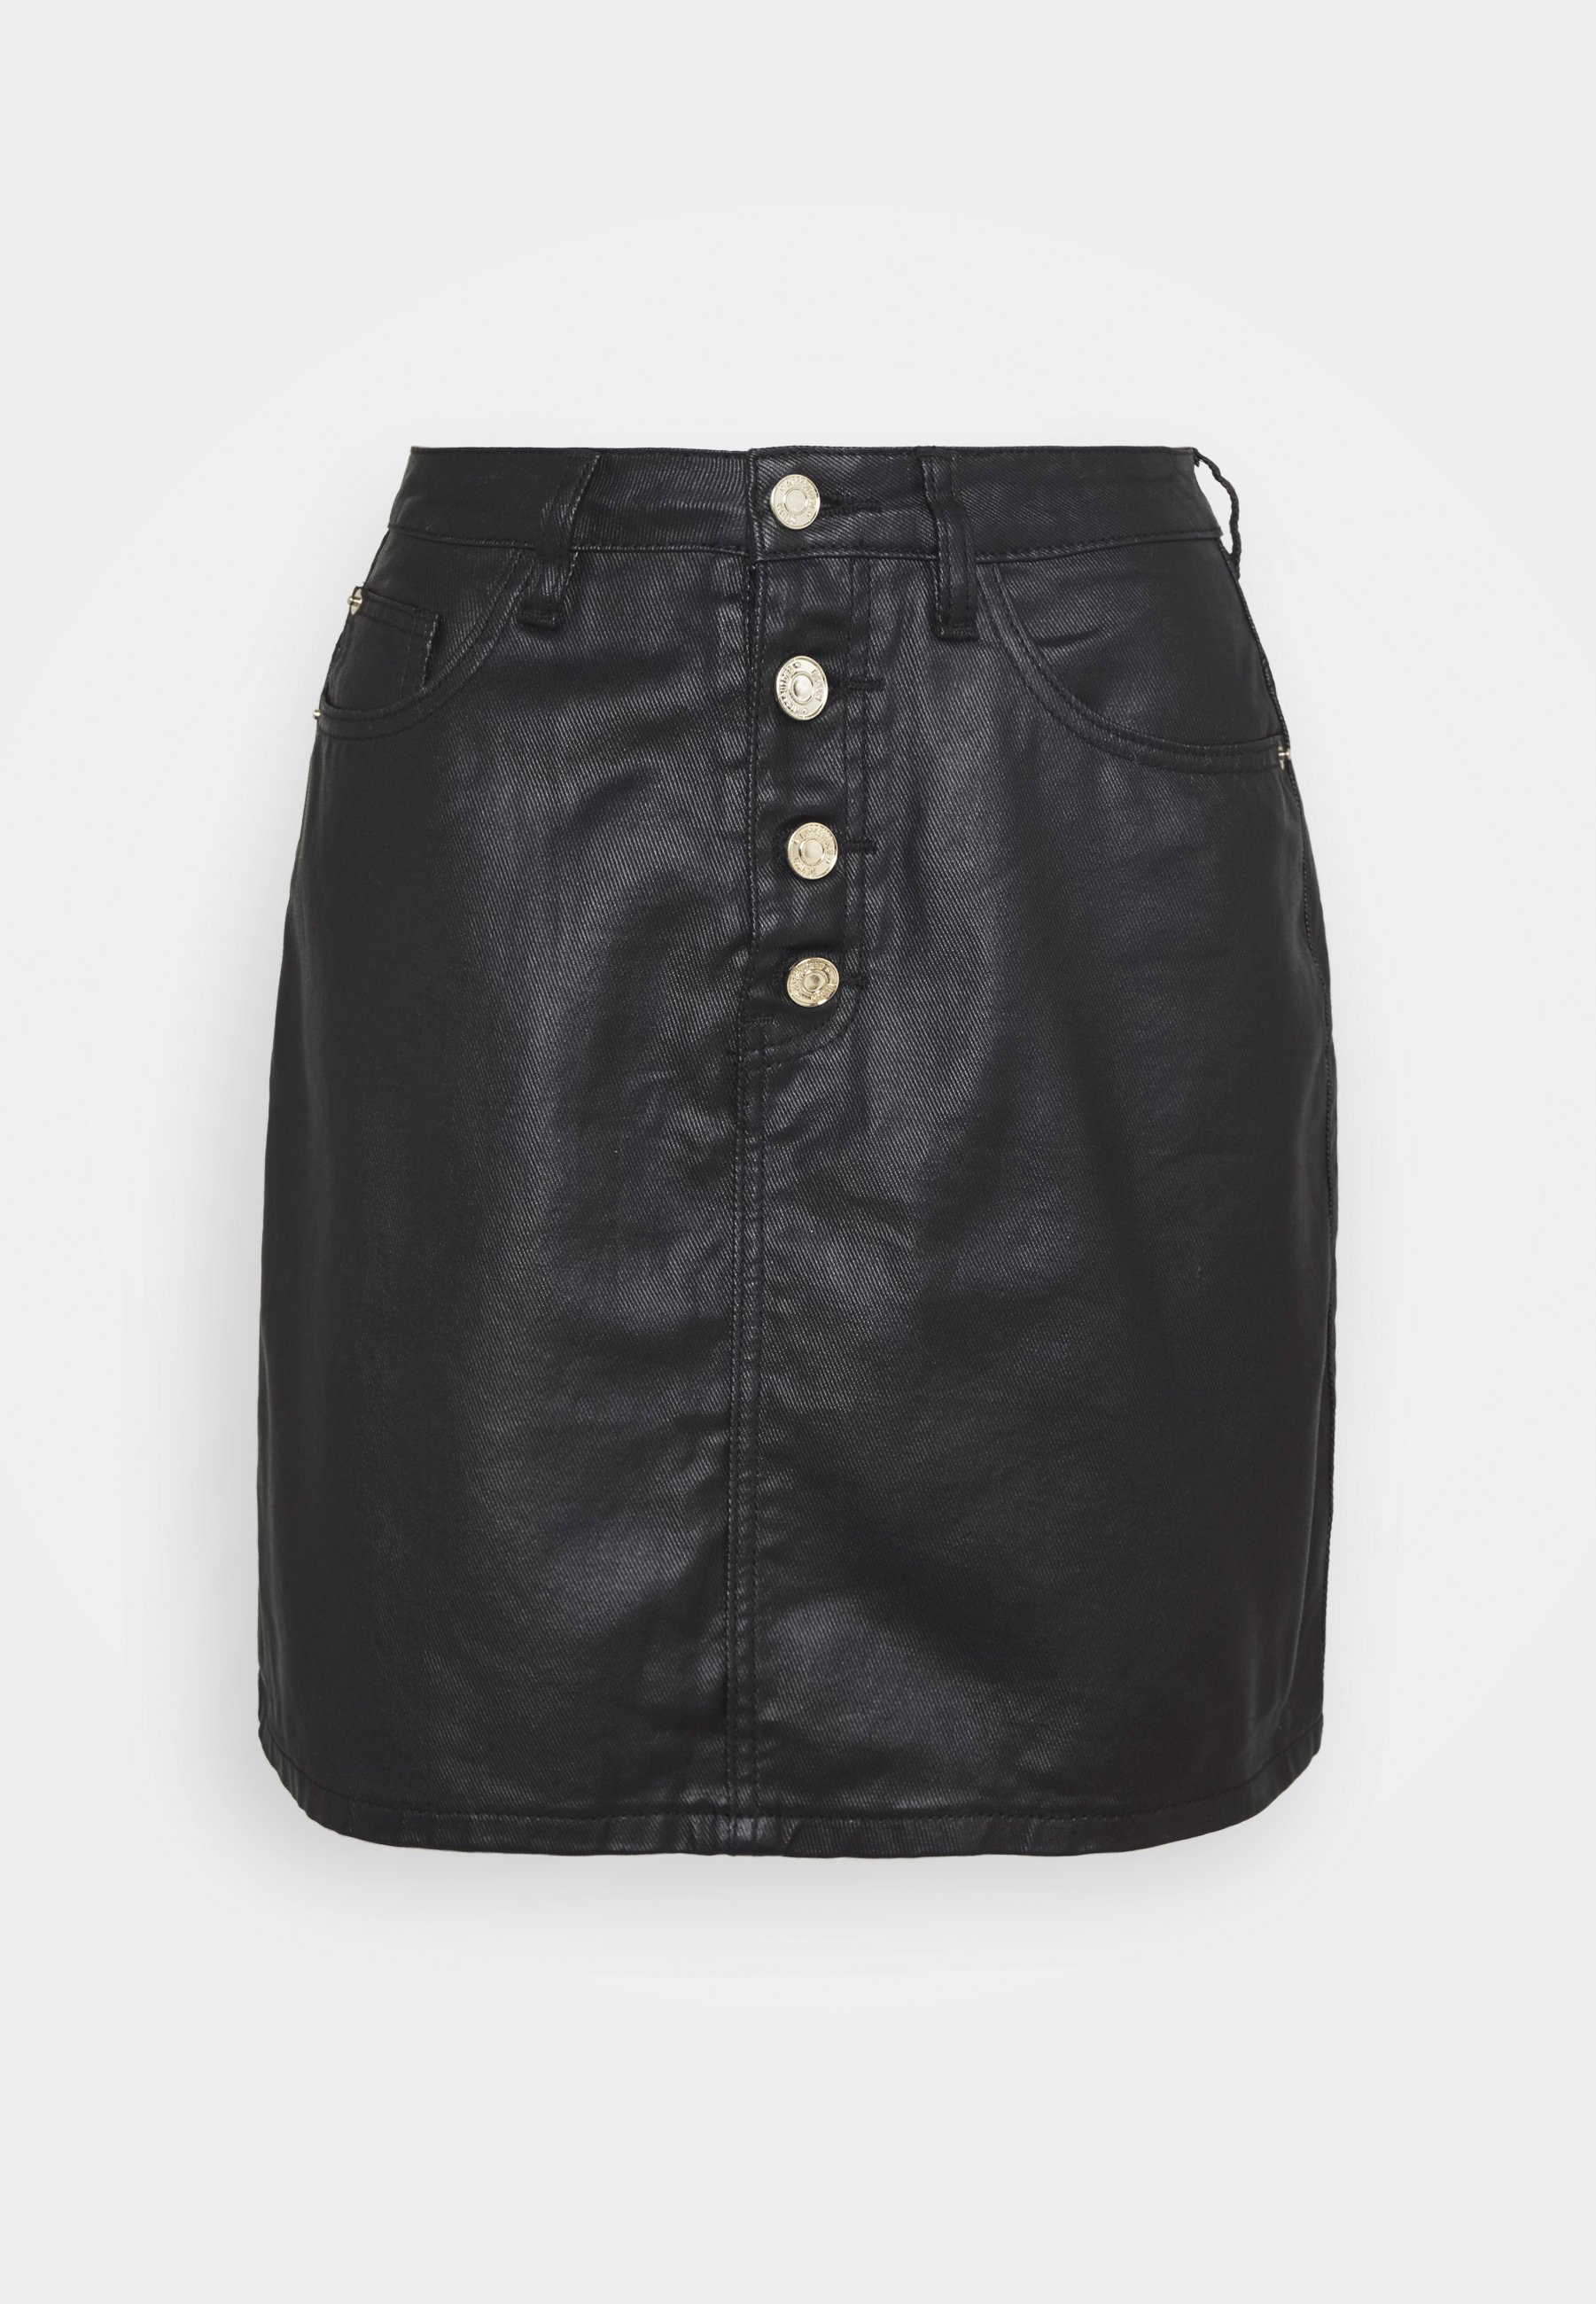 Femme COATED BUTTON MINI SKIRT - Jupe en jean